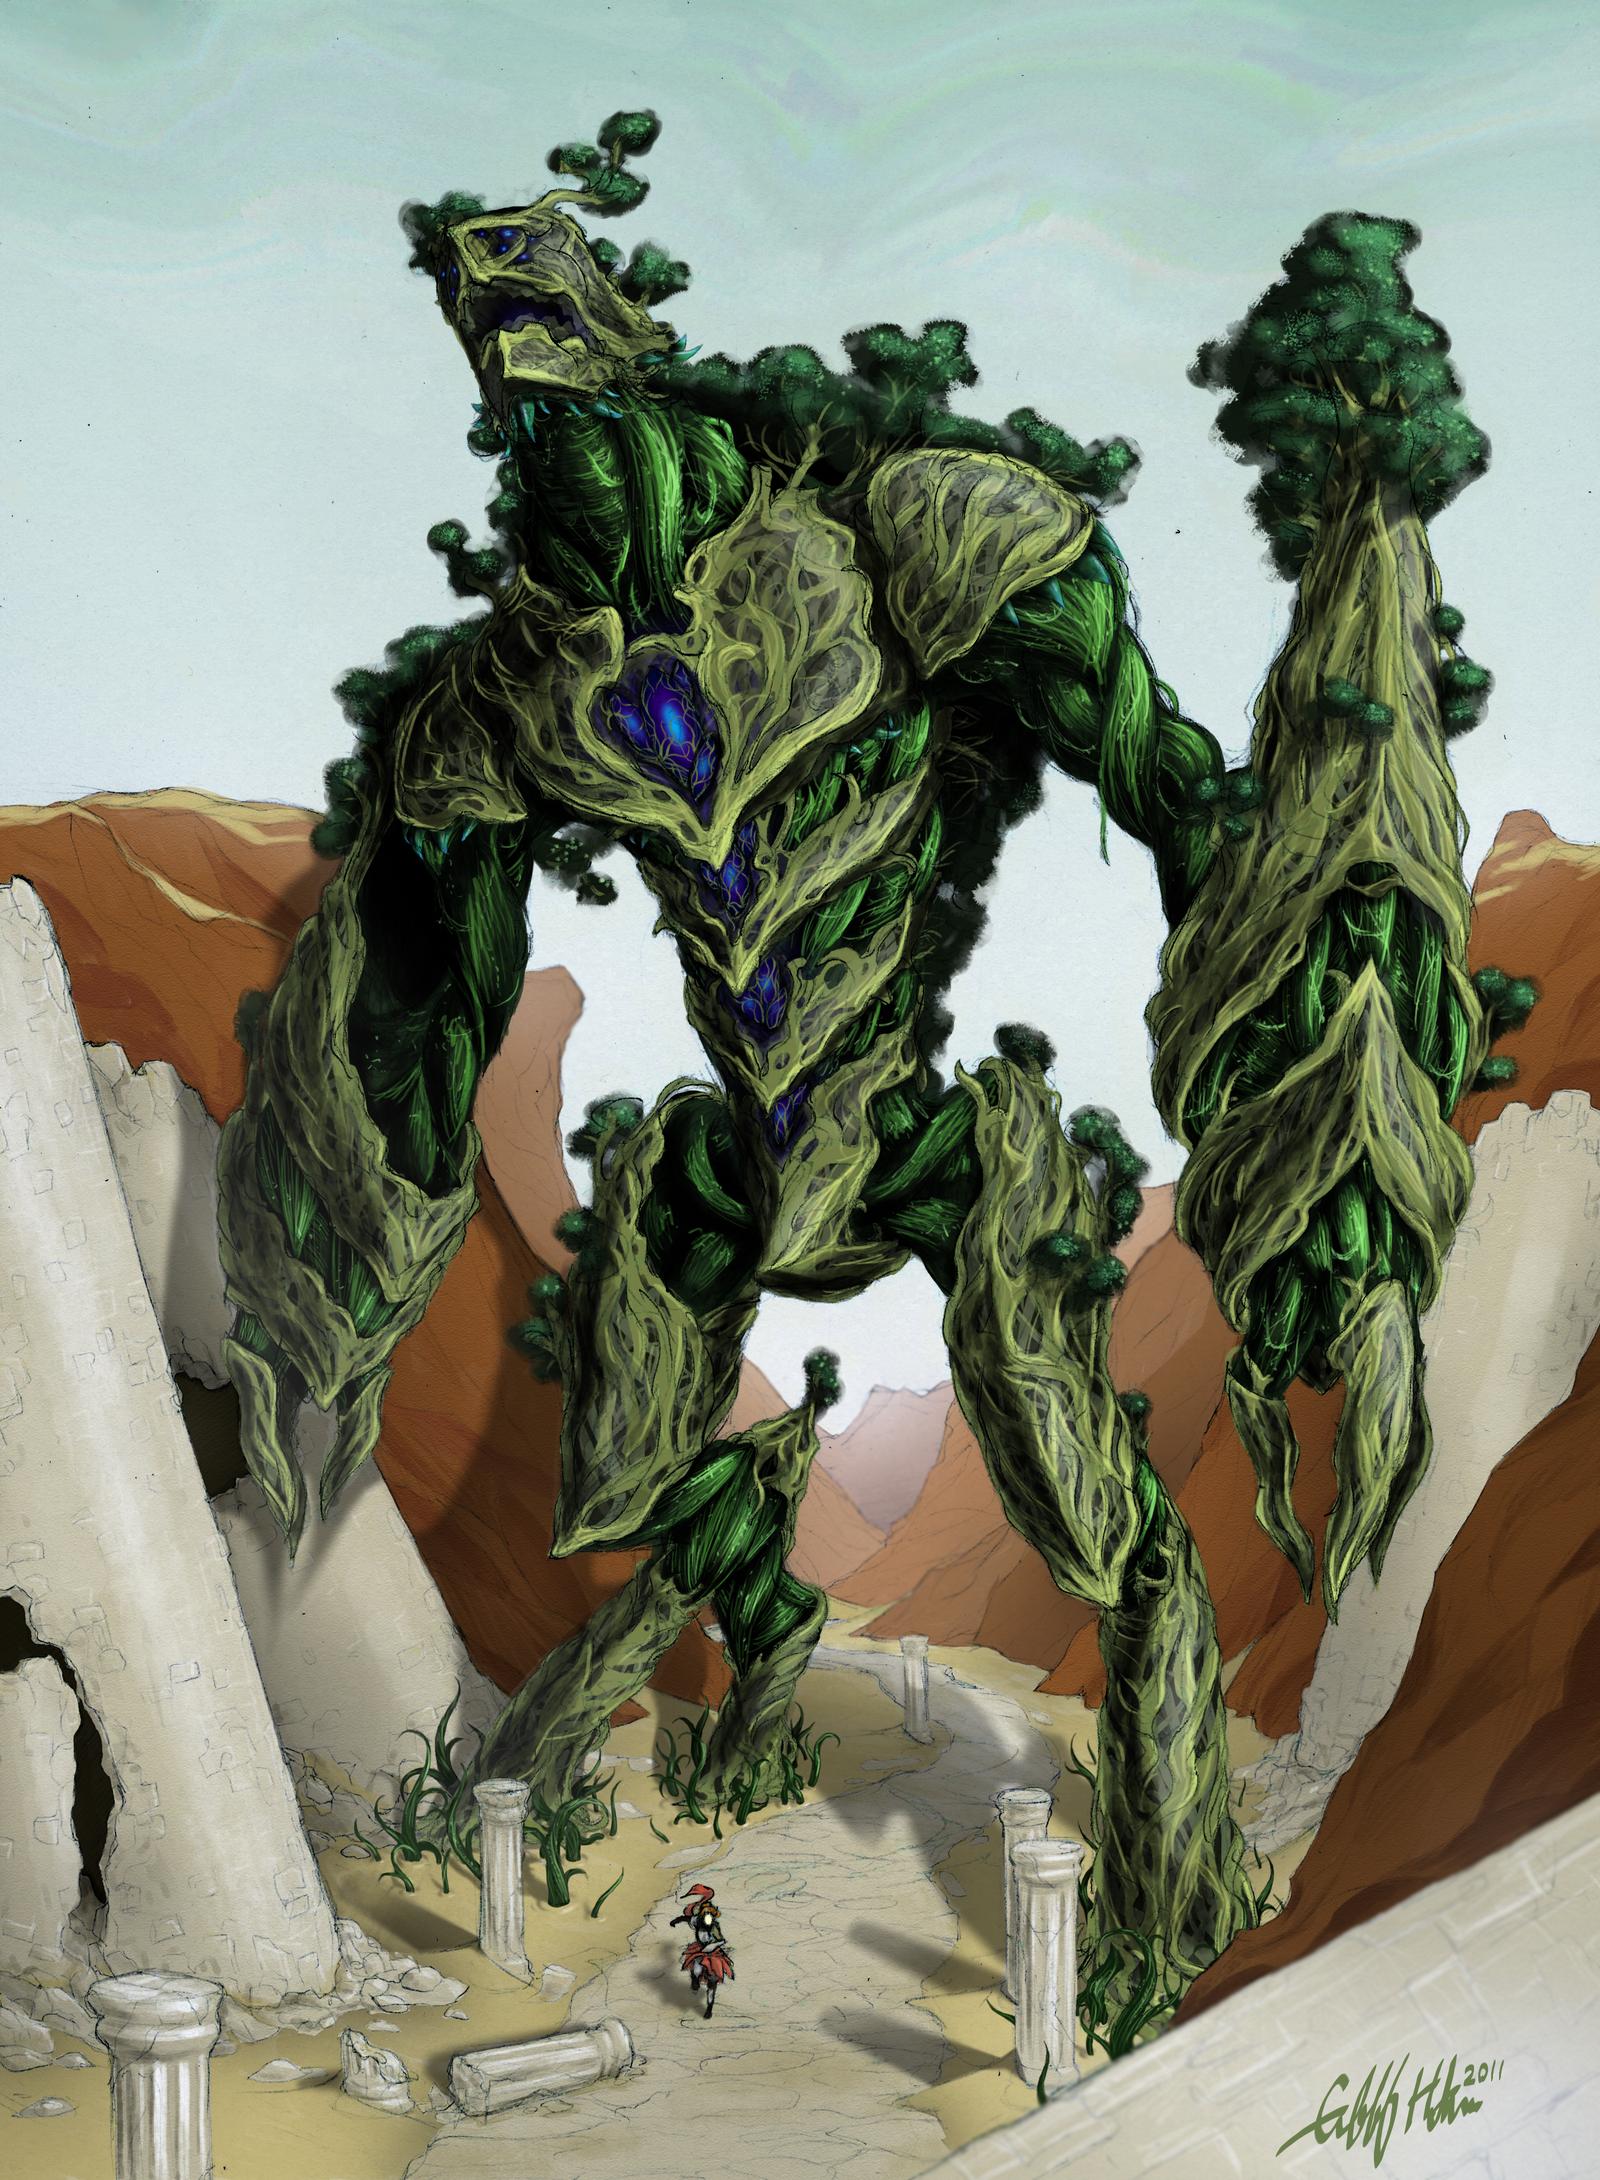 Arbordaunt - Life Colossus by Tekka-Croe